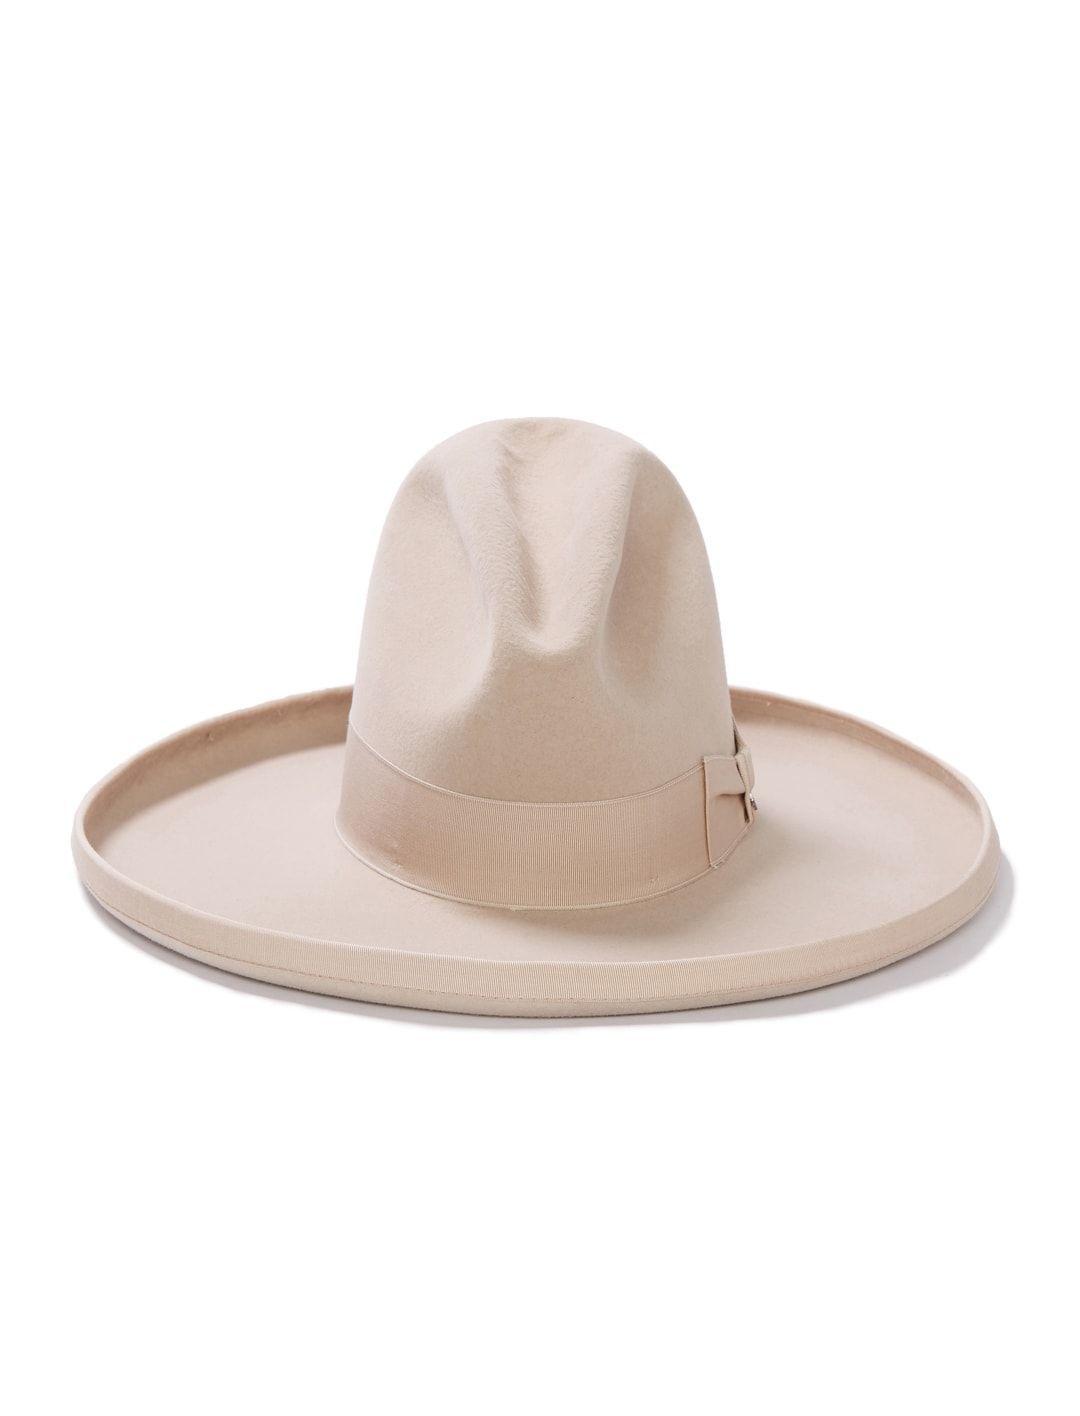 4327f22cae768 Stetson Men s Tom Mix 6X Cowboy Hat SFTMIXB2850. Details